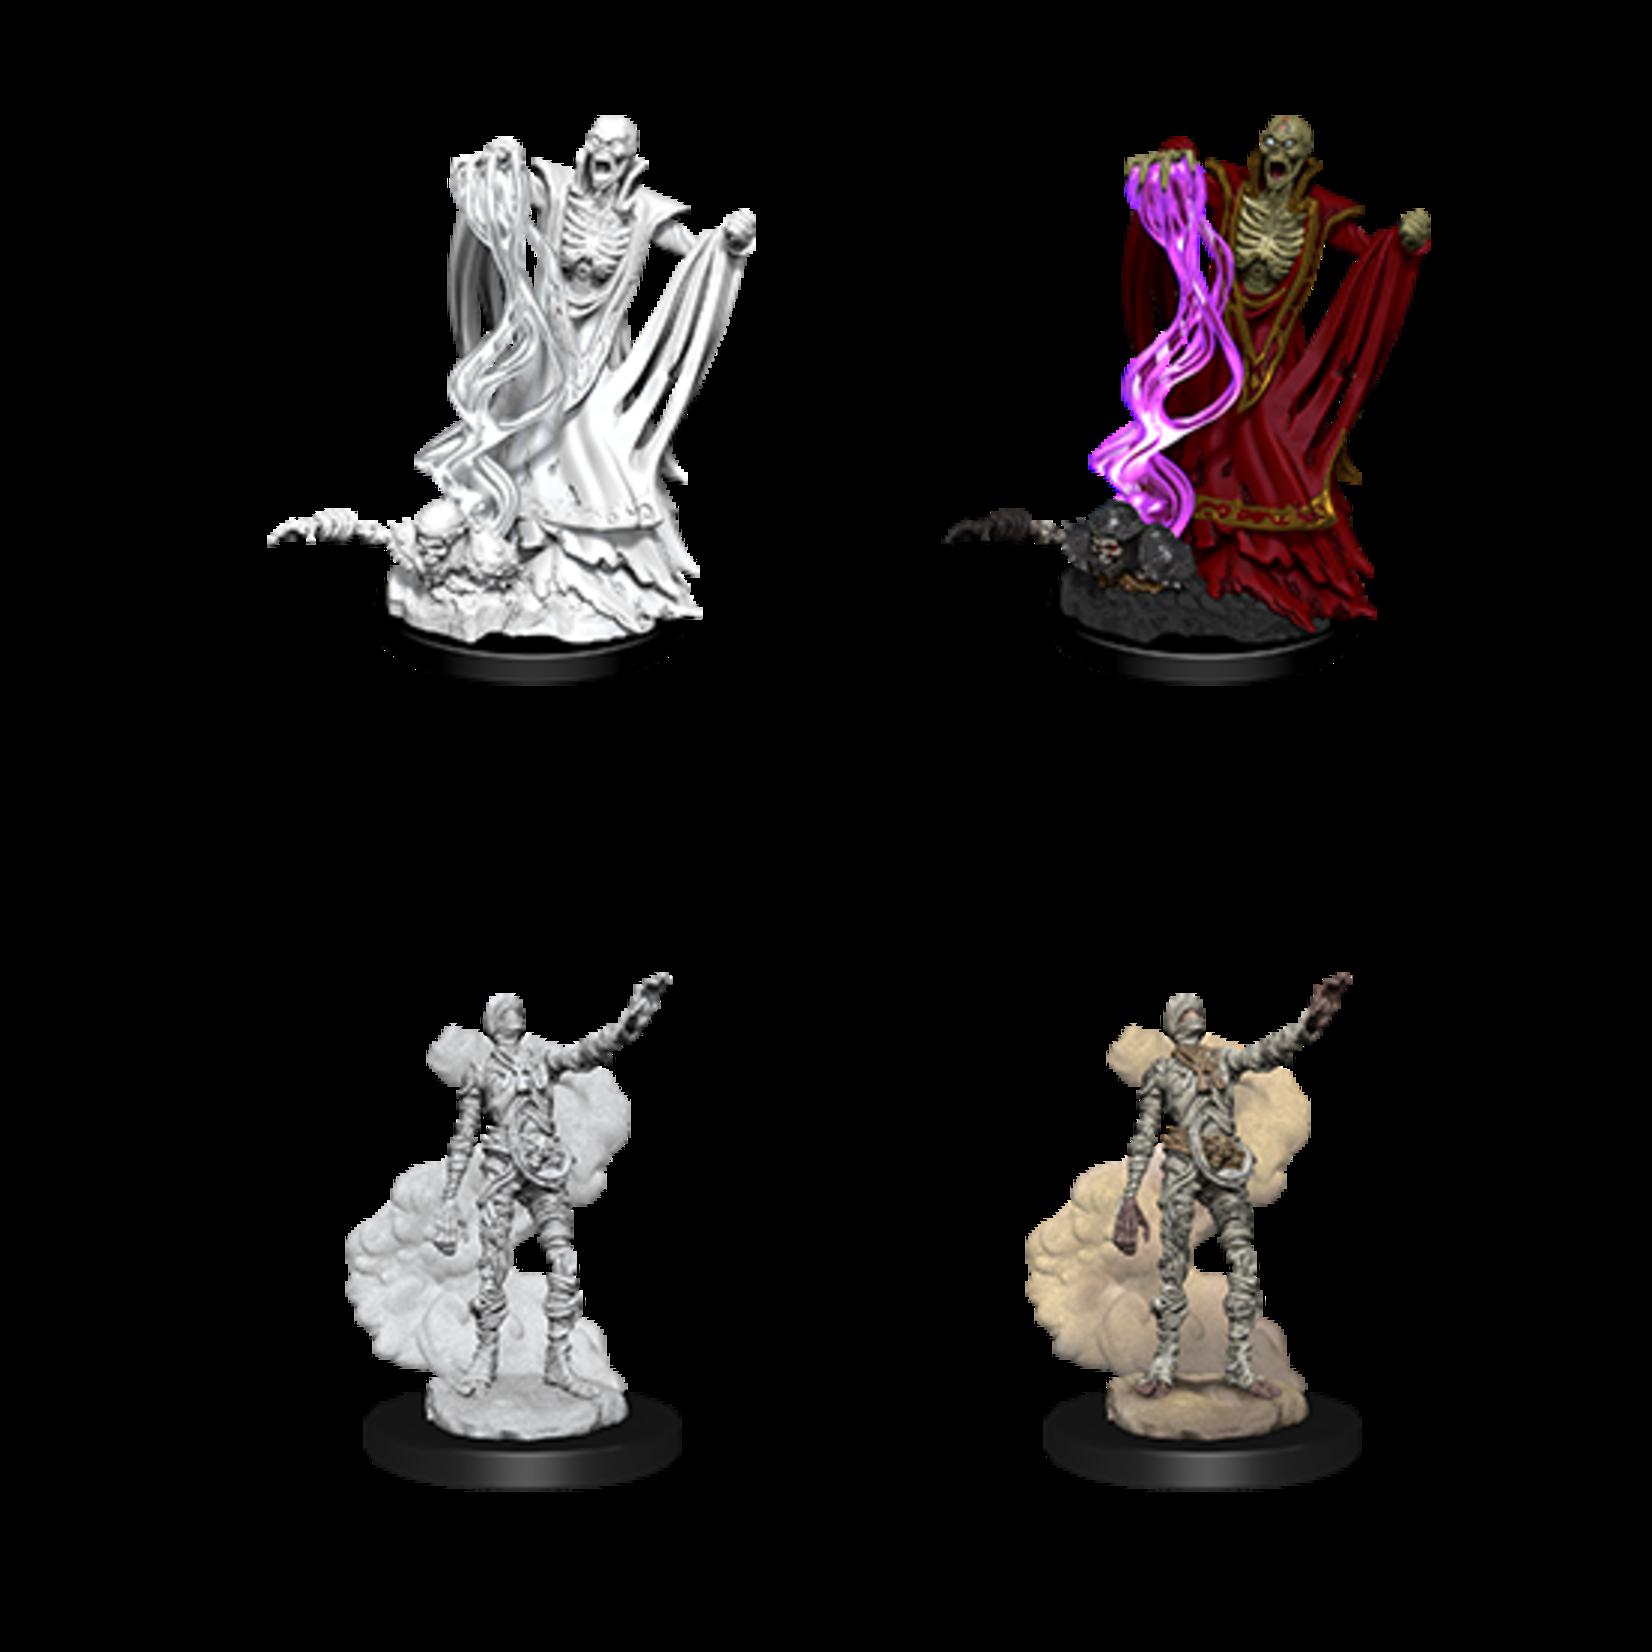 WizKids D&D Nolzur's Marvelous Miniatures: Lich & Mummy Lord (W11)